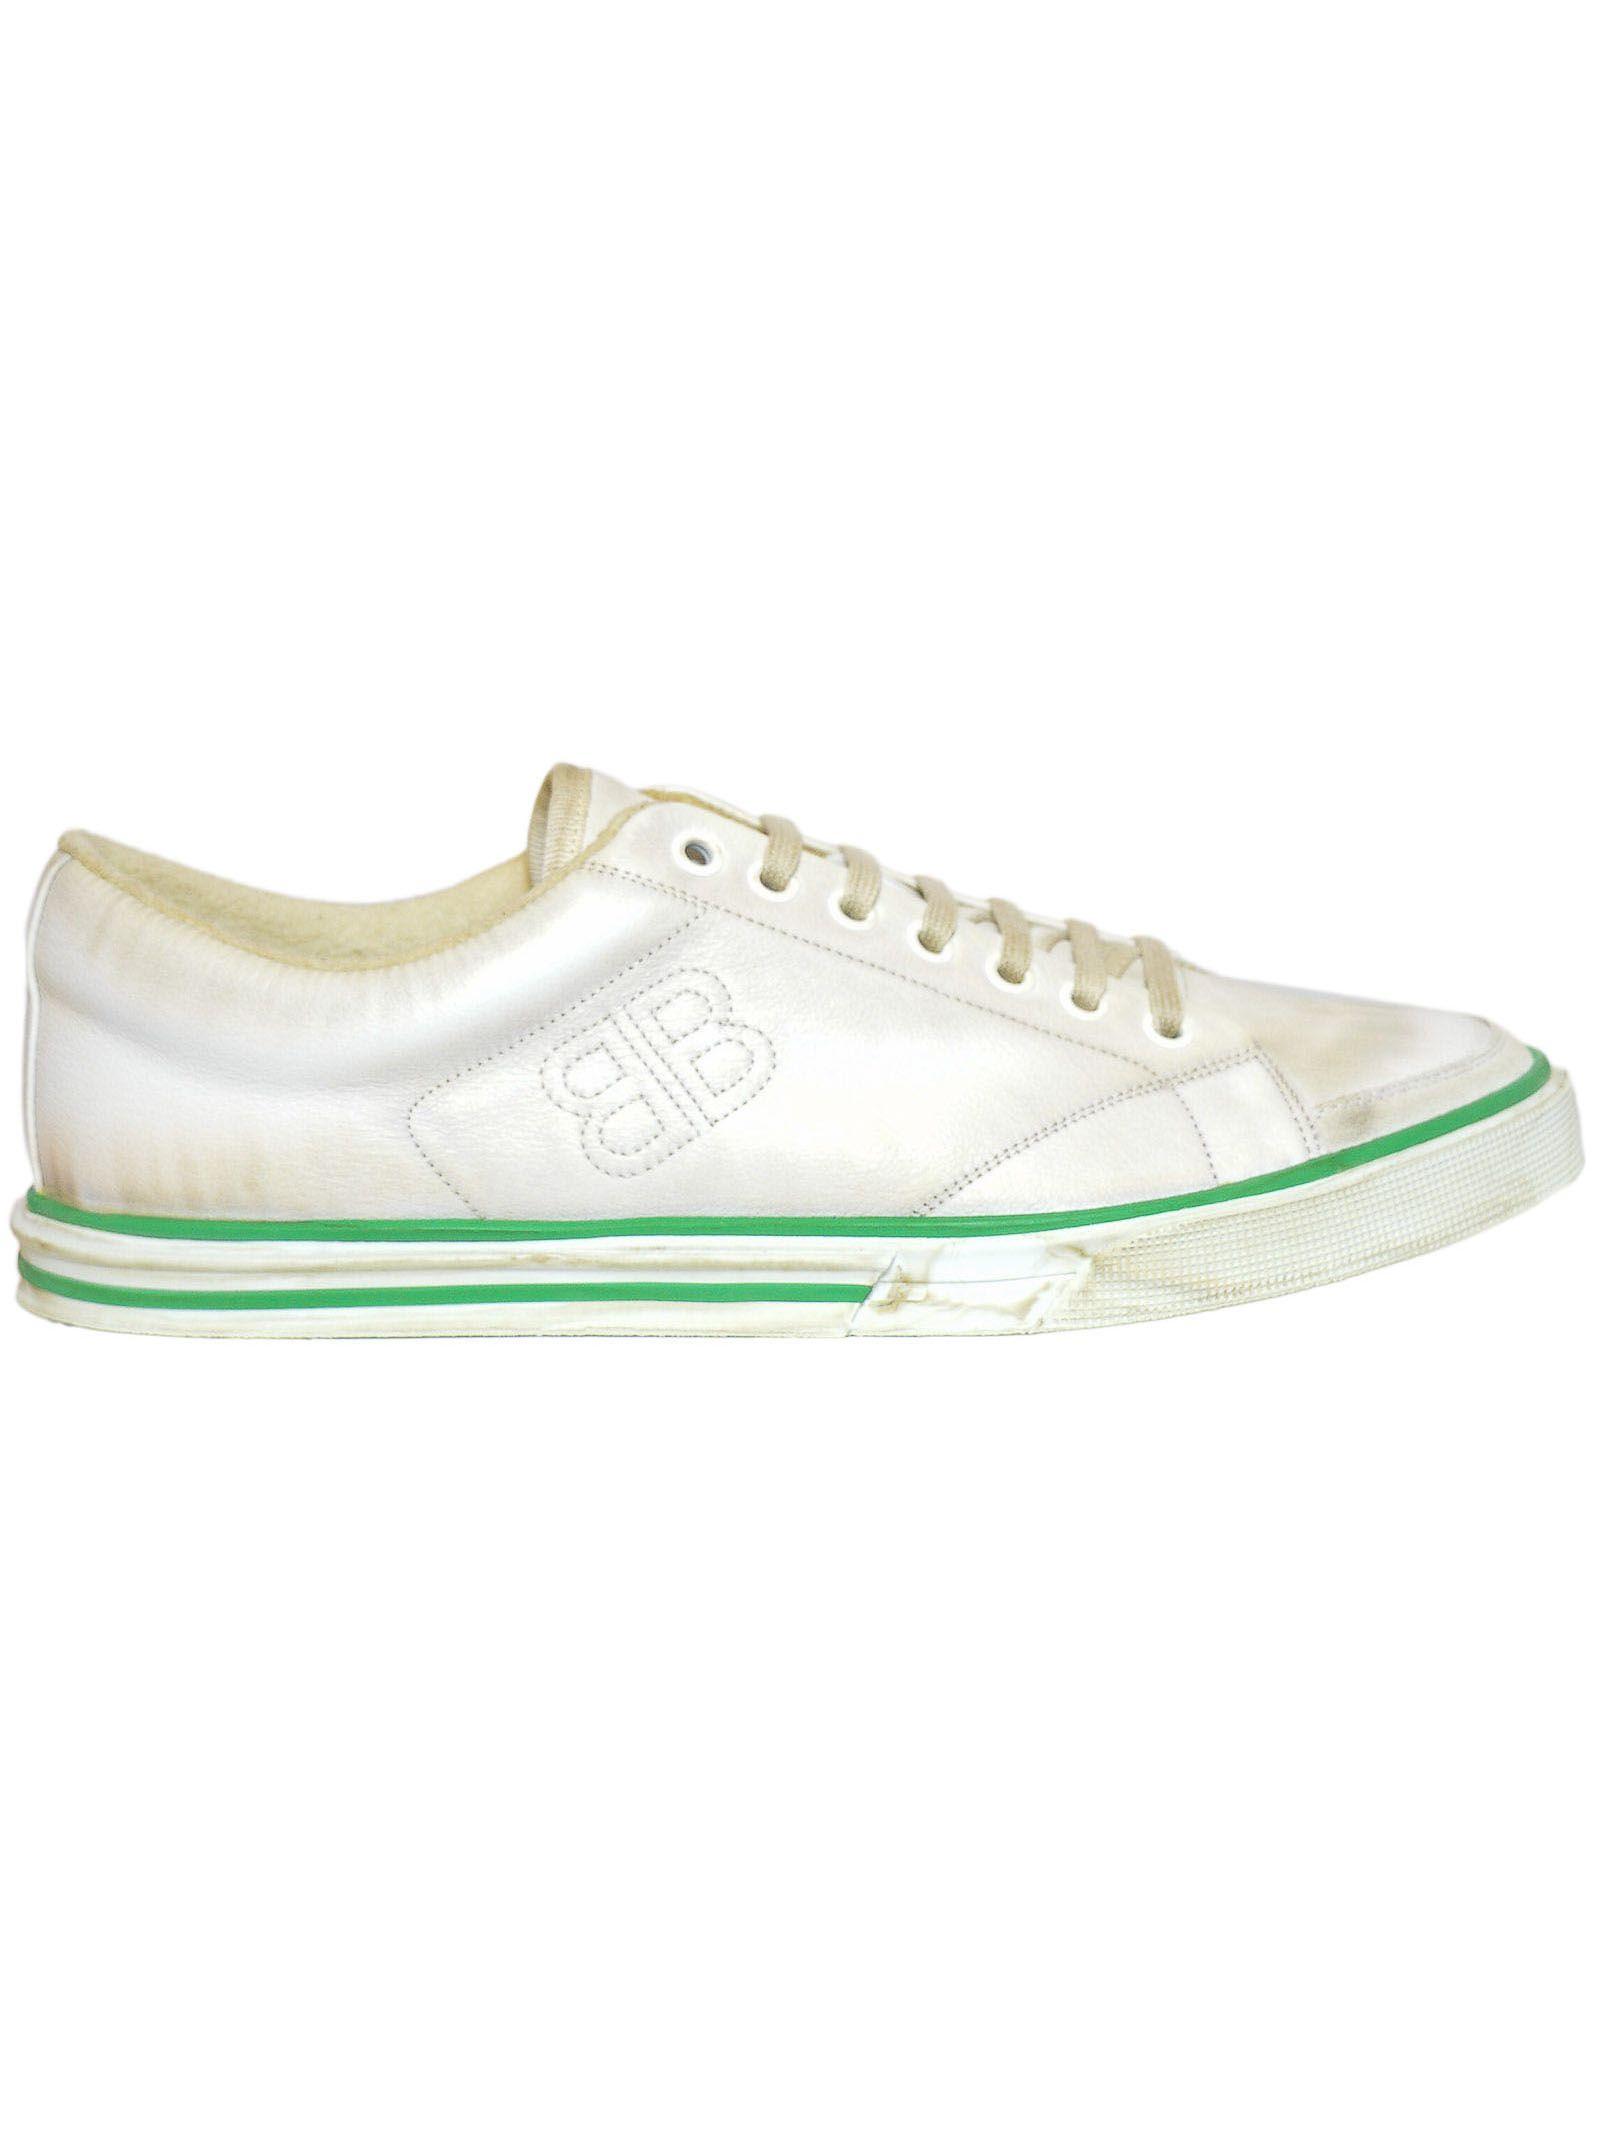 Balenciaga Match Low Sneakers